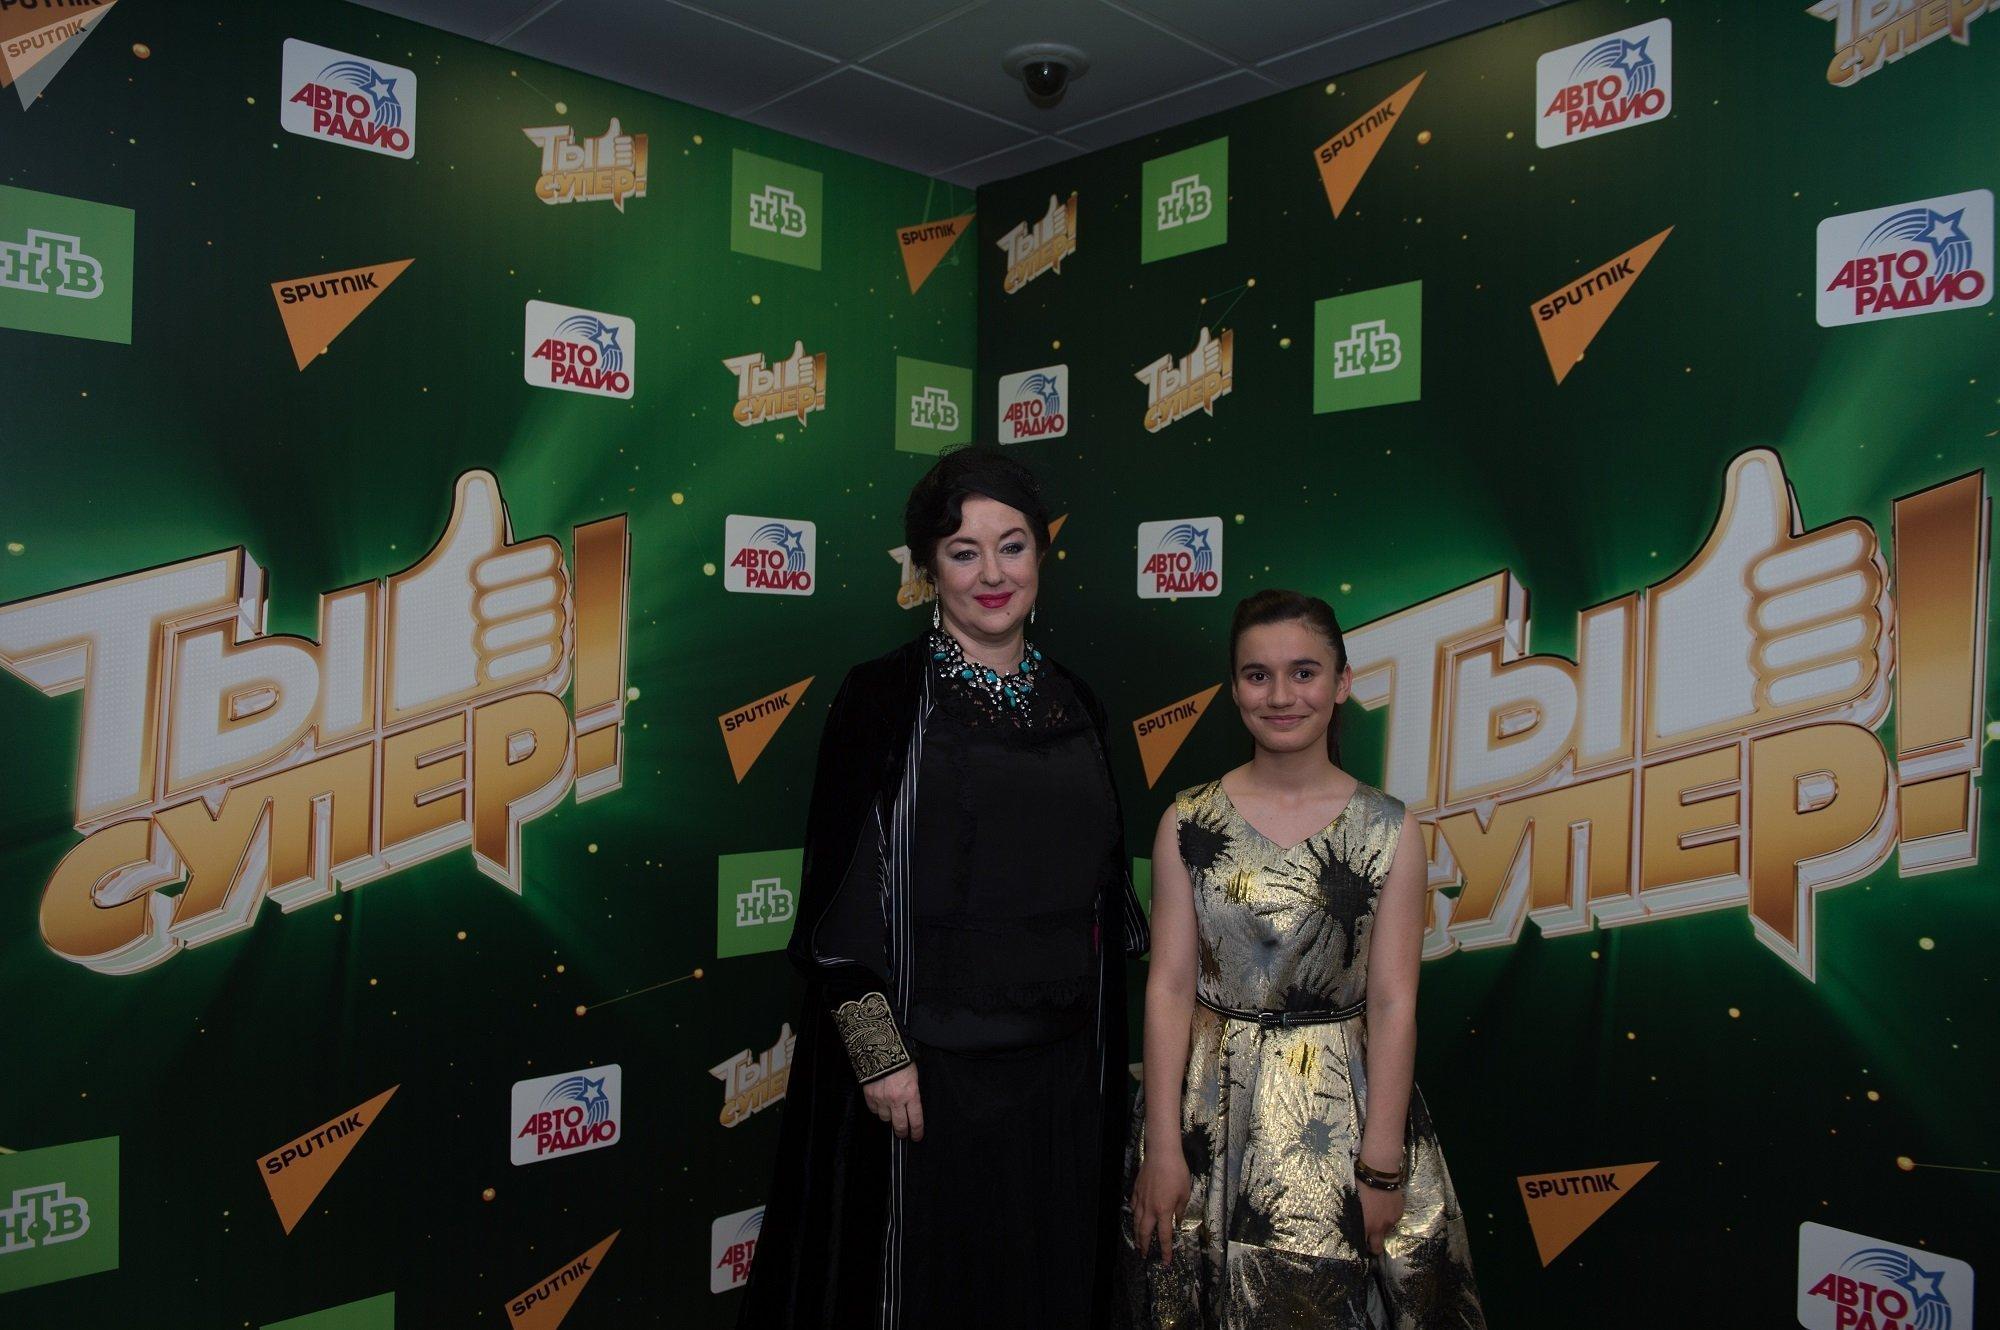 Певица Тамара Гвердцители и участница проекта Ты супер! Нана Вардзелашвили